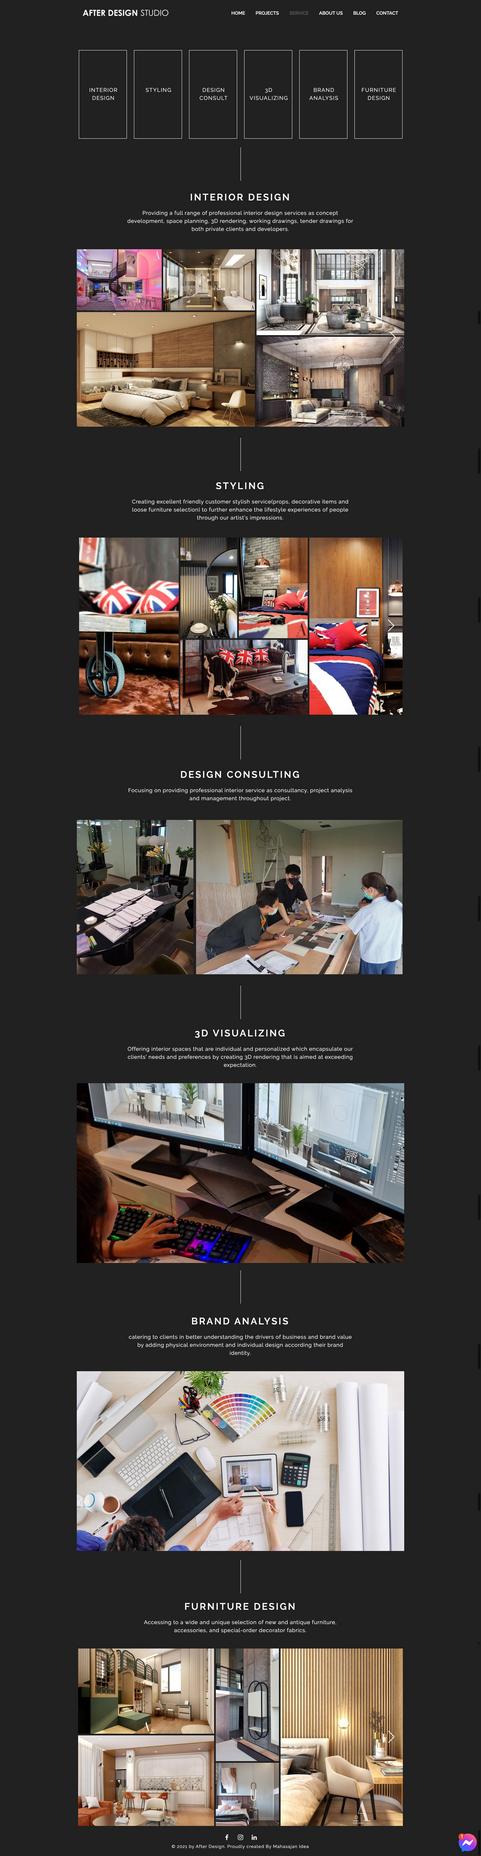 2021-06-05-09-43-www.afterdesign-living.